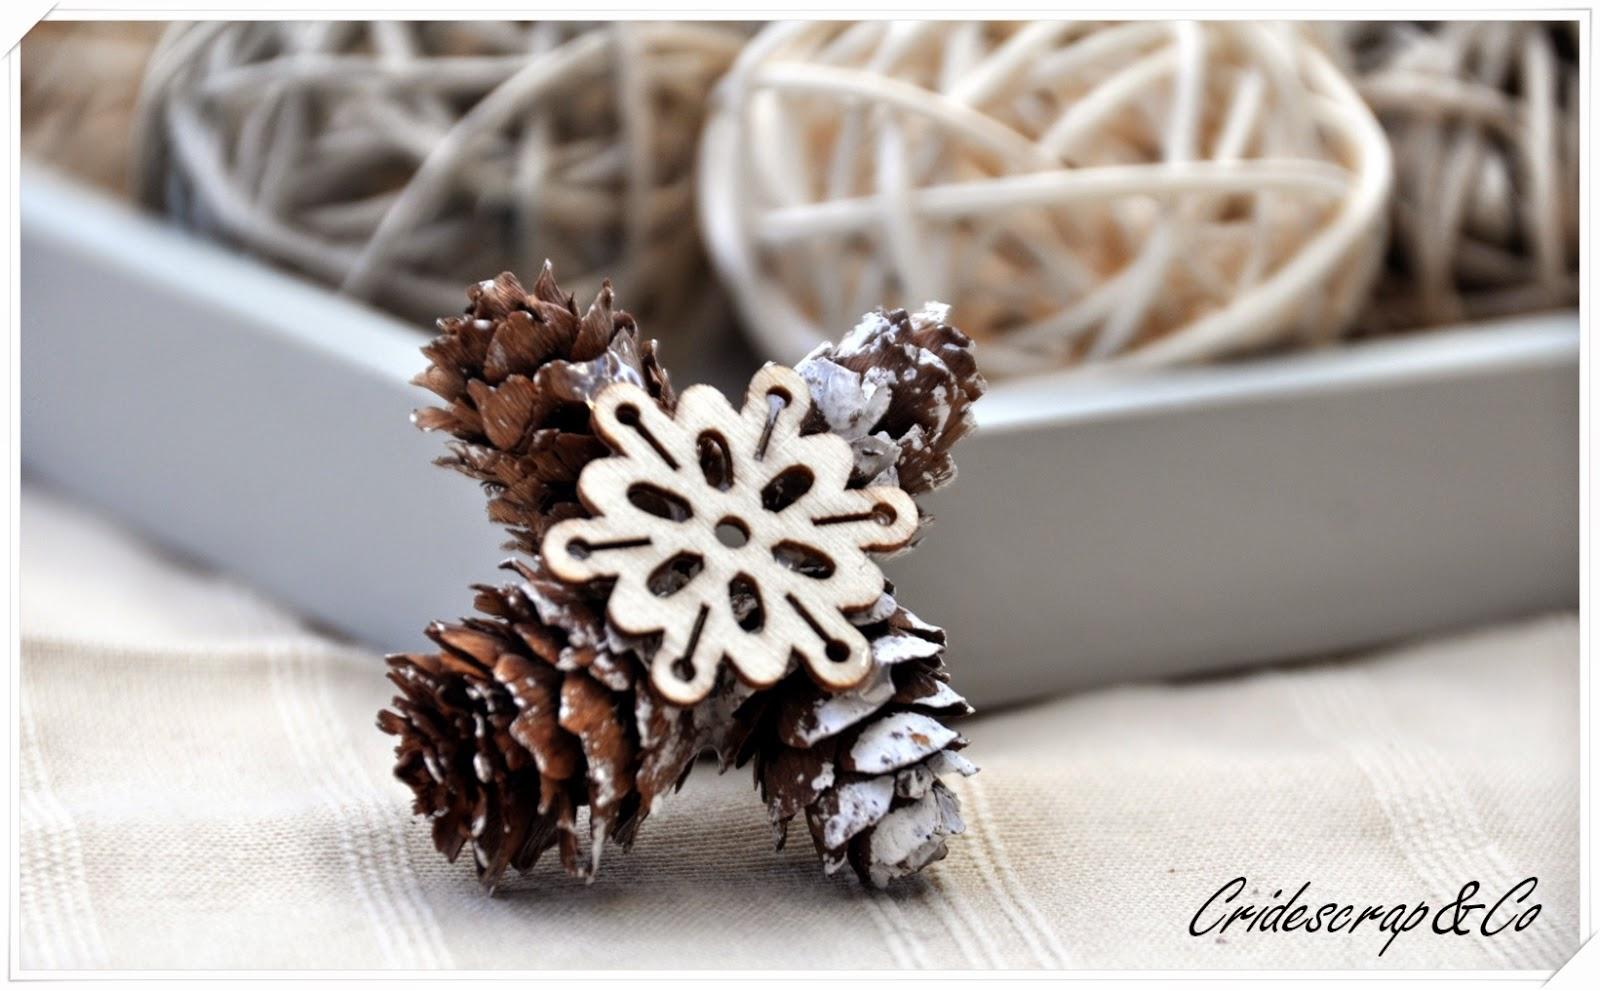 la boutique deco de cridescrap co cing flocons de neige en mini pommes de pin. Black Bedroom Furniture Sets. Home Design Ideas